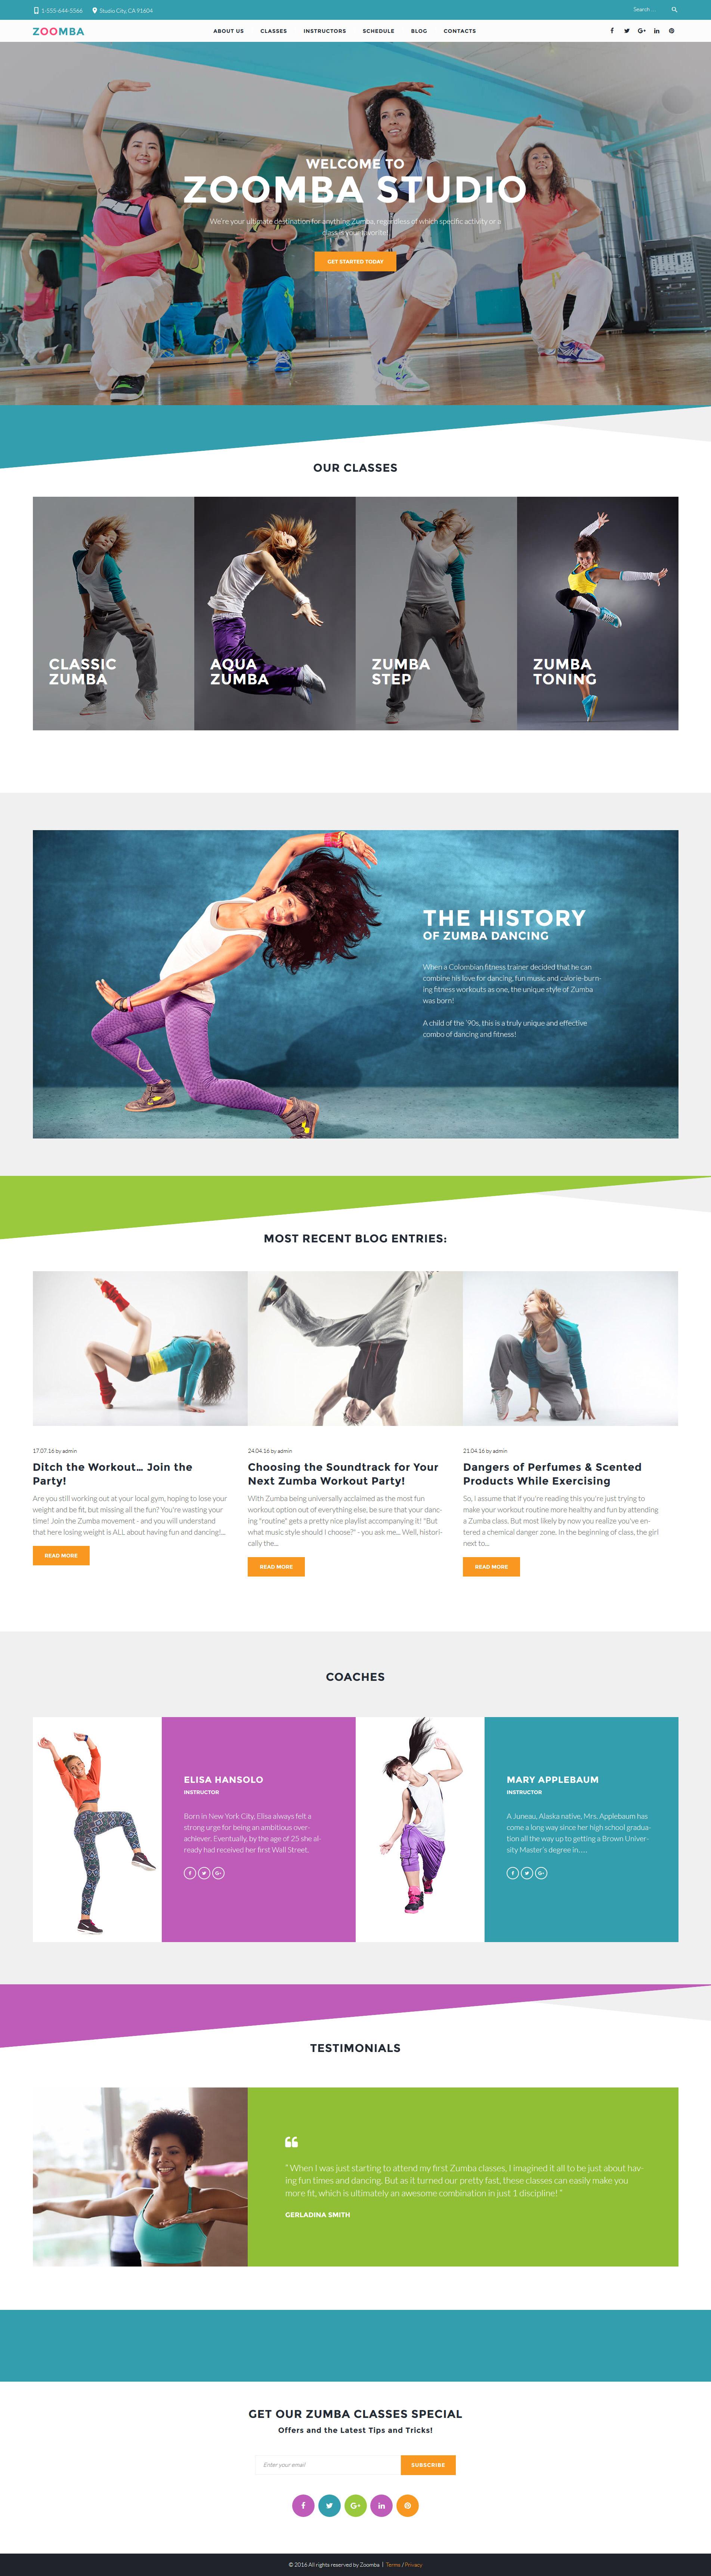 """Zoomba - Zoomba Dance Studio"" 响应式WordPress模板 #61364"